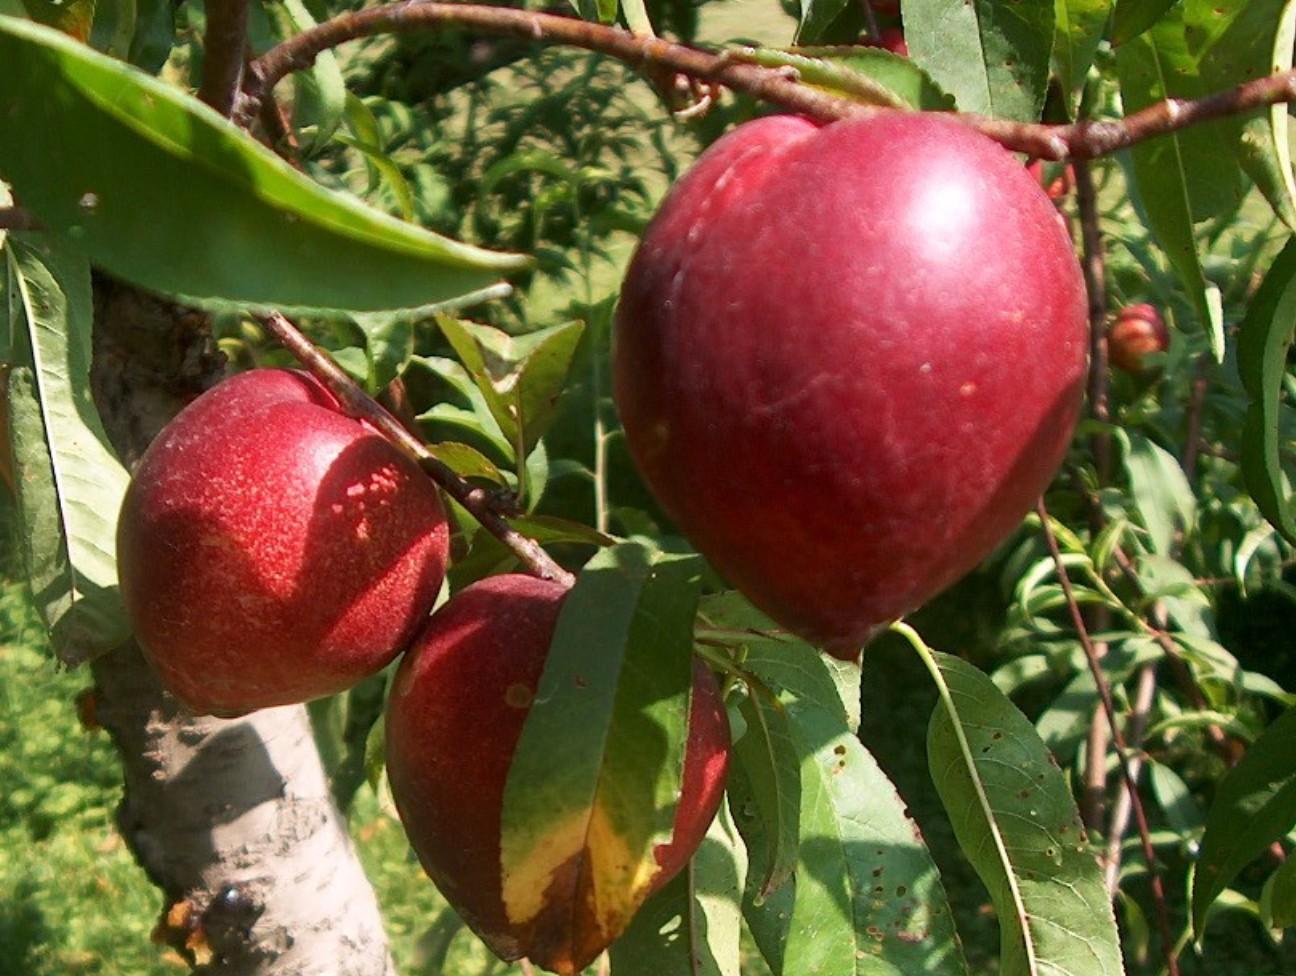 Prunus persica var. nucipersica / Prunus persica var. nucipersica